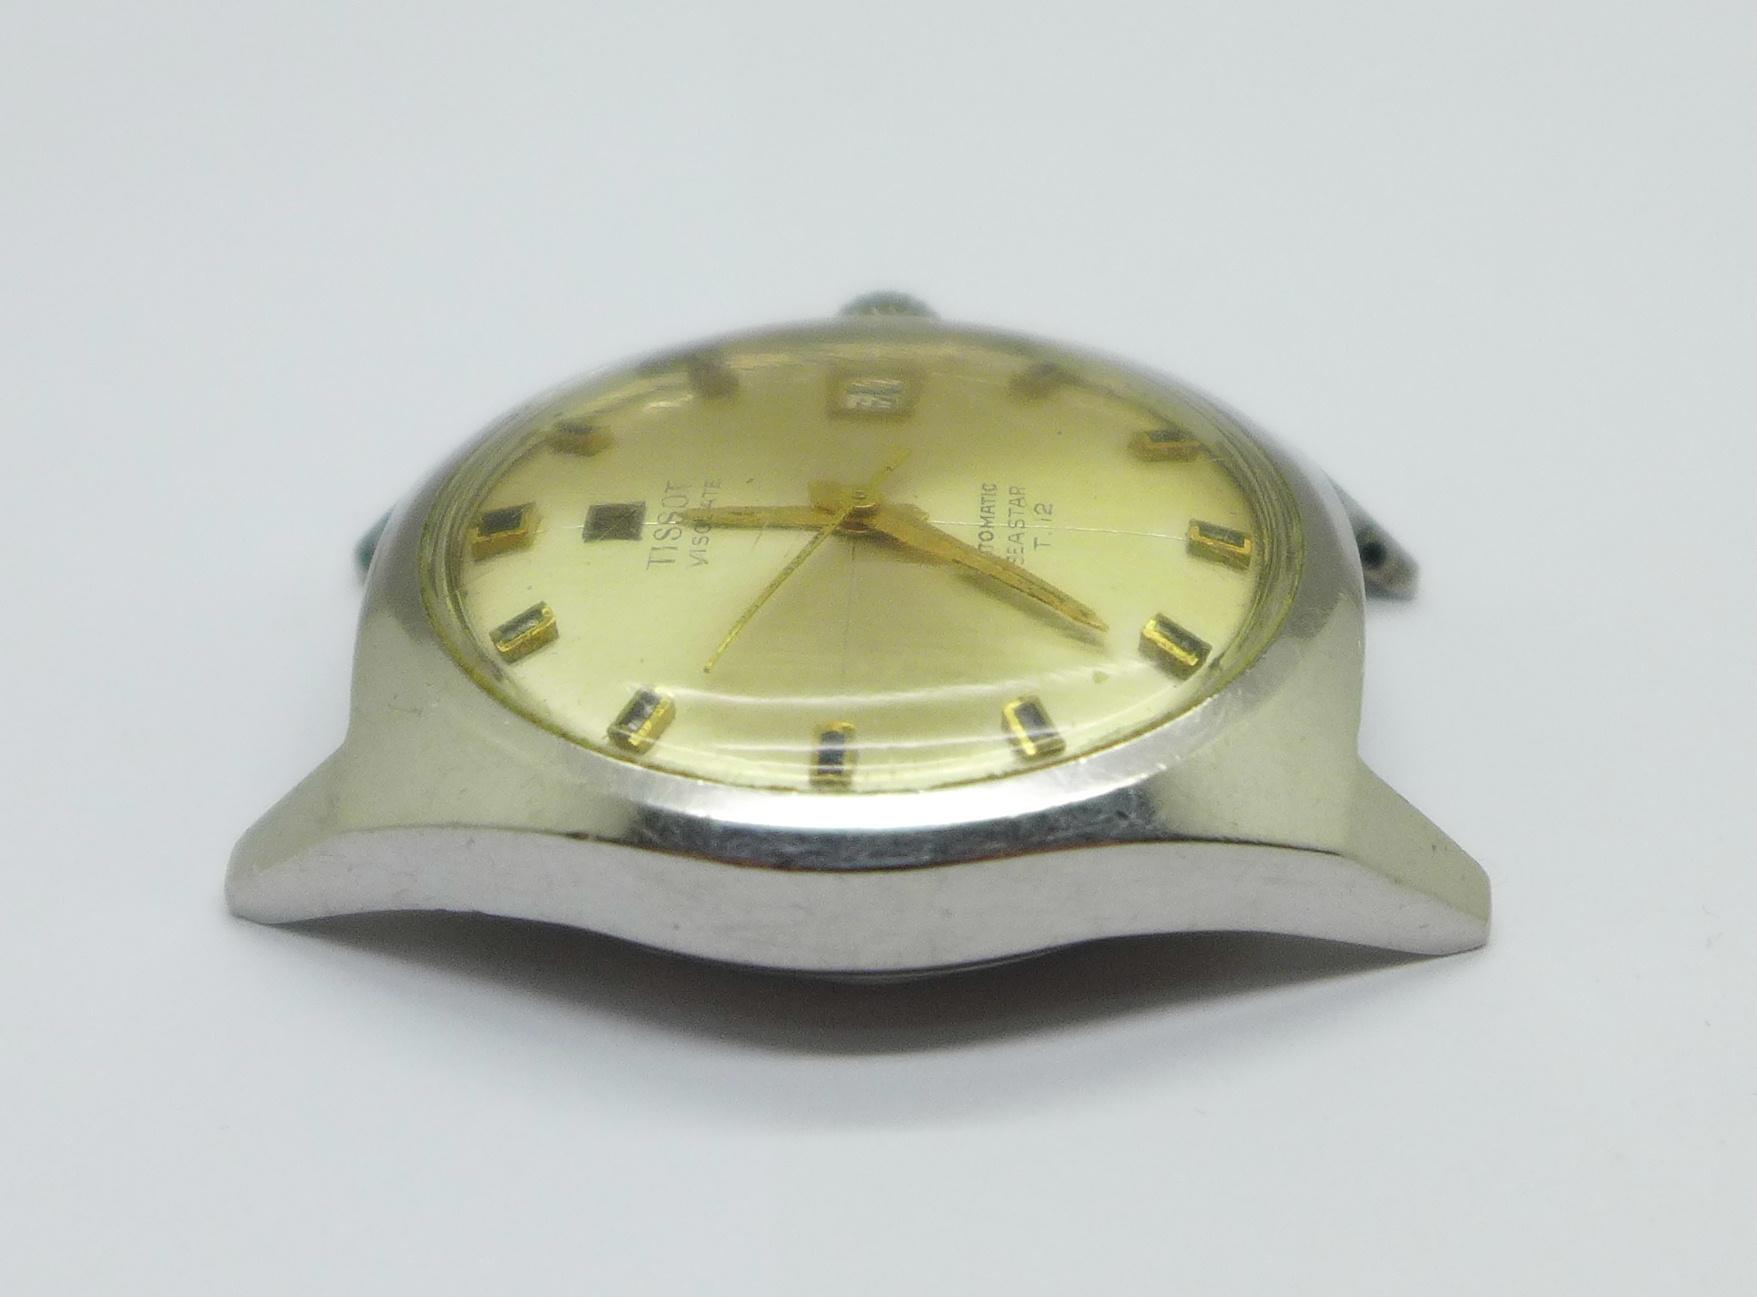 A Tissot Visodate Seastear T12 automatic wristwatch - Image 3 of 6